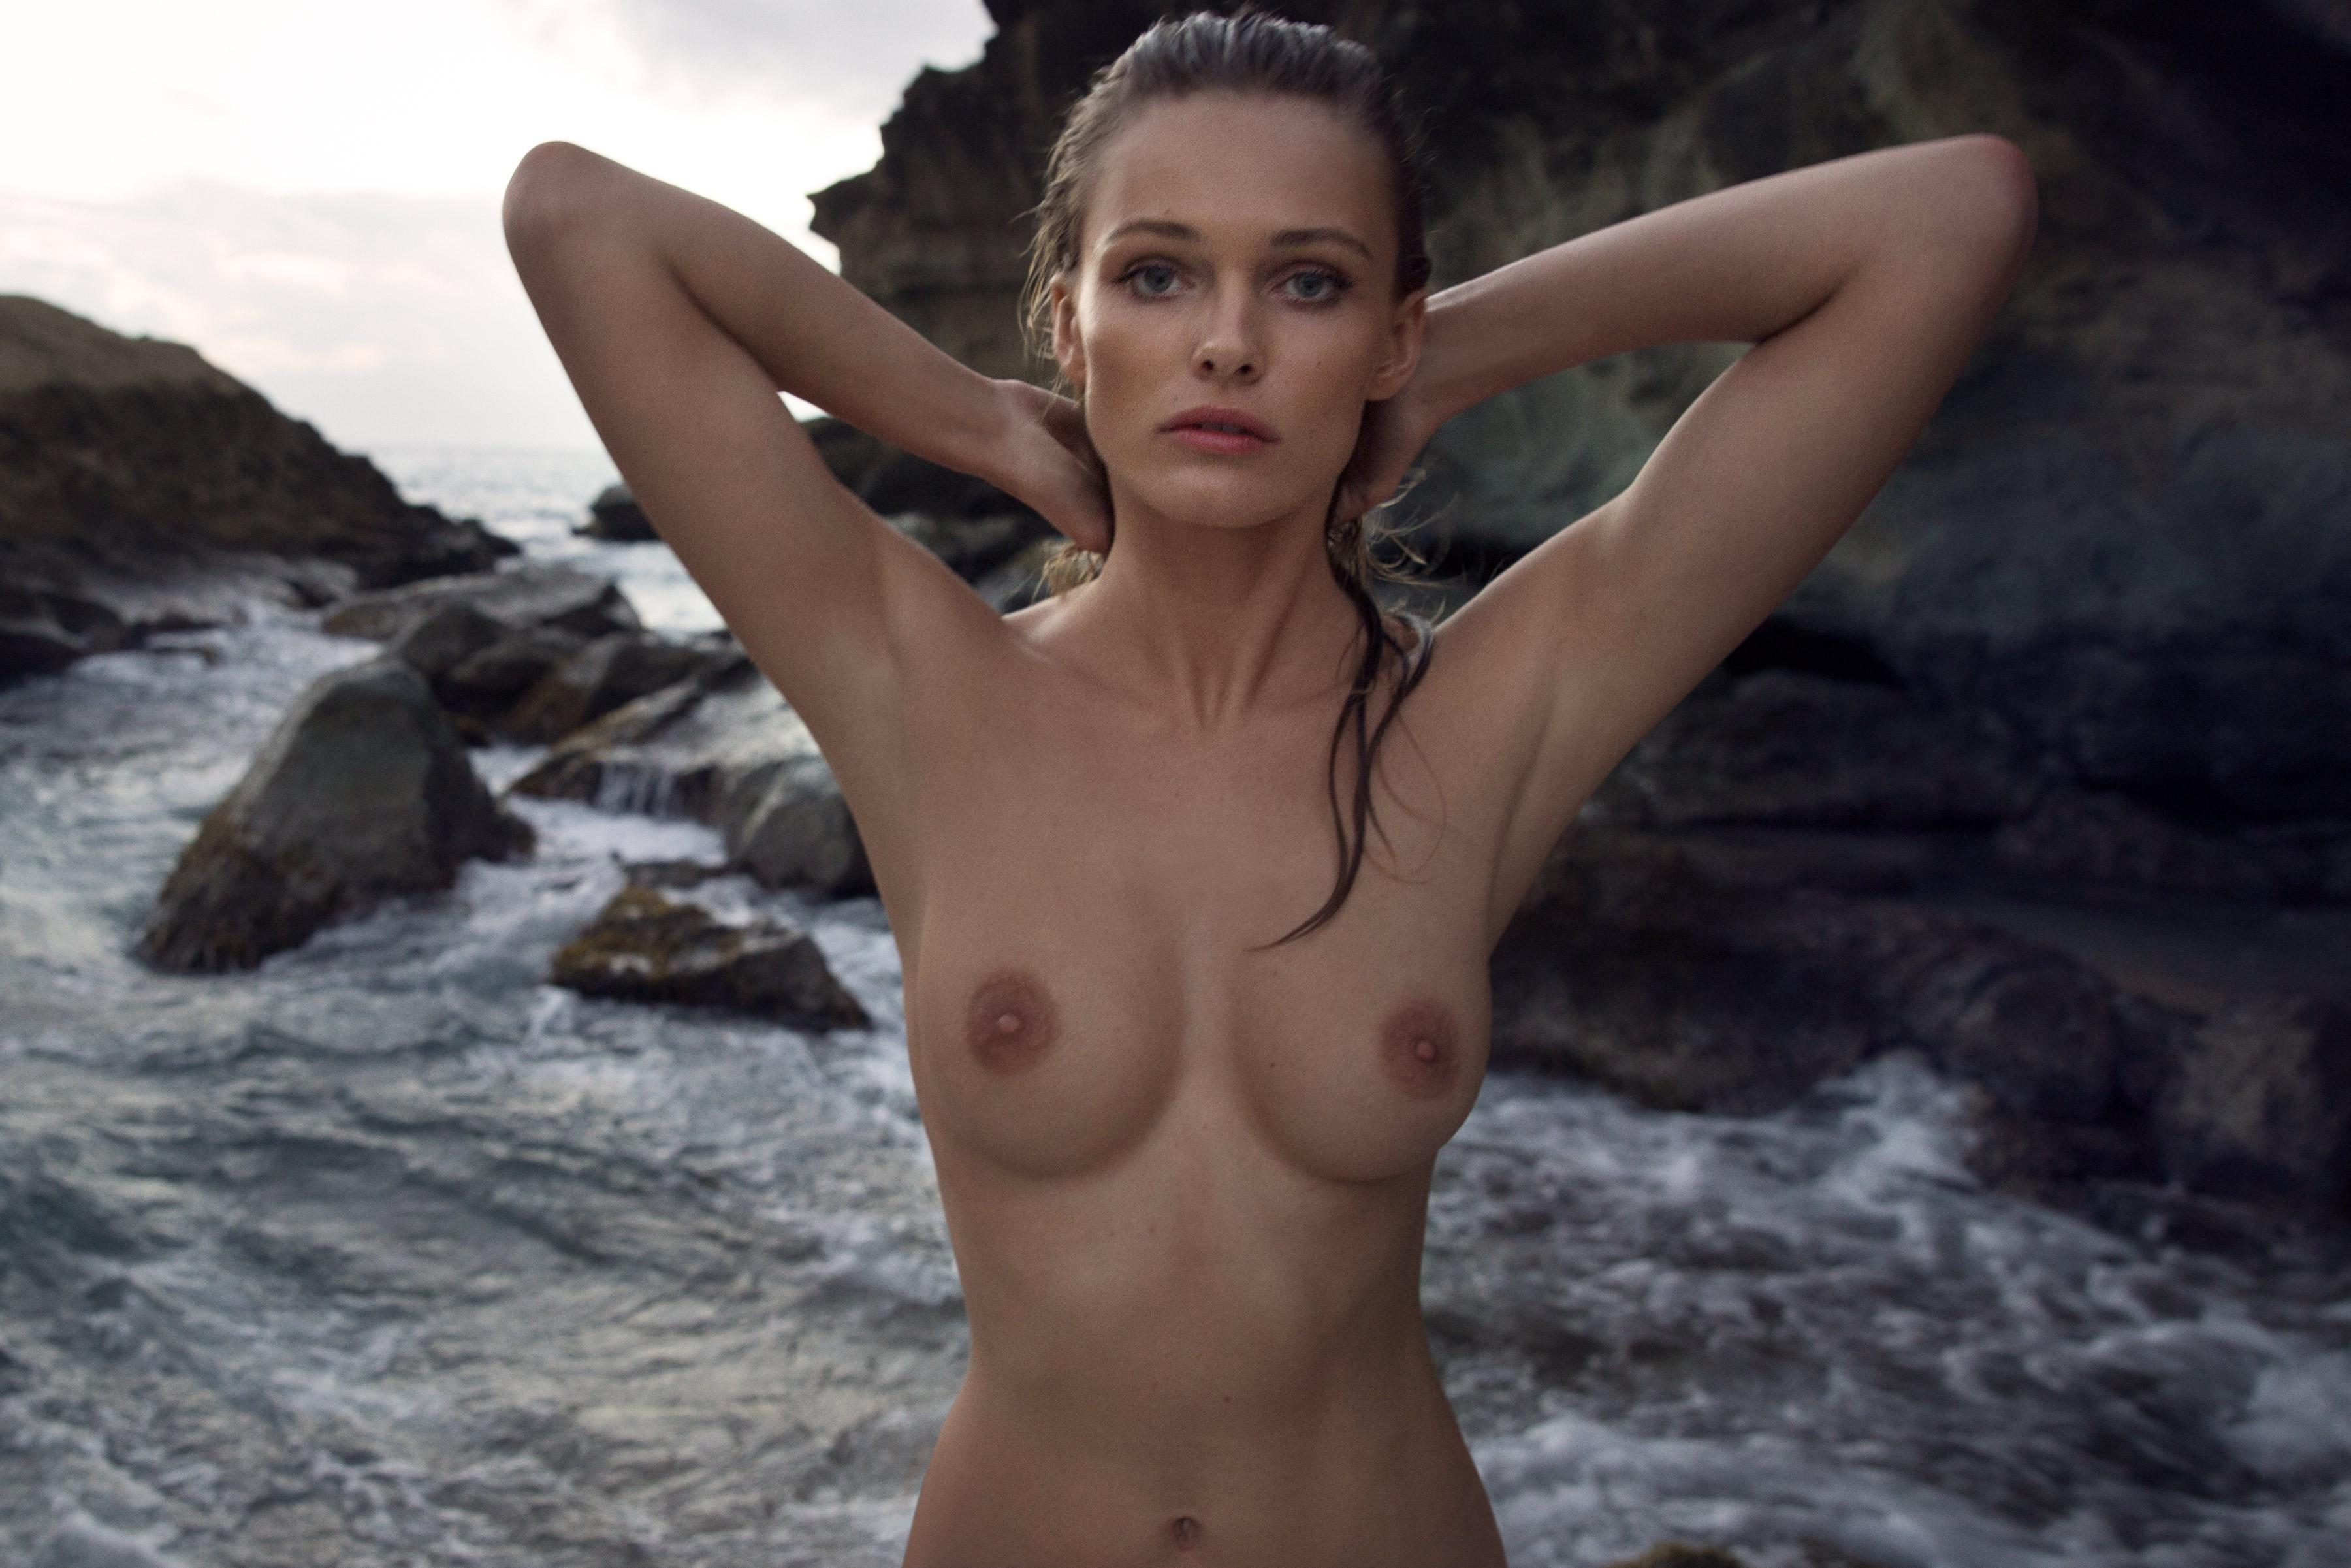 Watch Edita vilkeviciute naked video